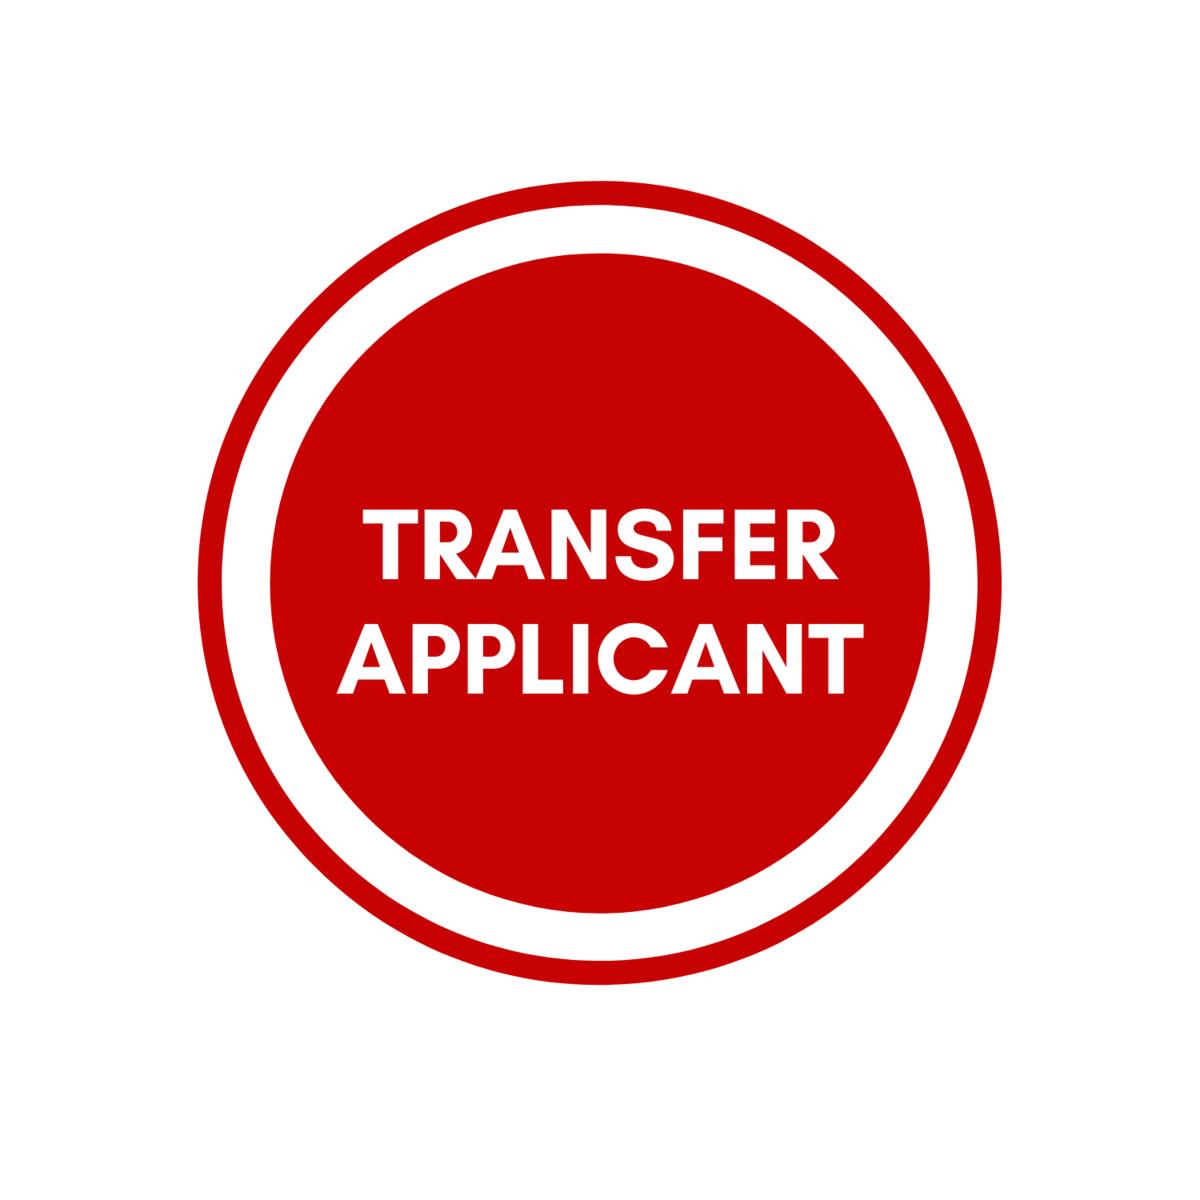 Transfer Applicant